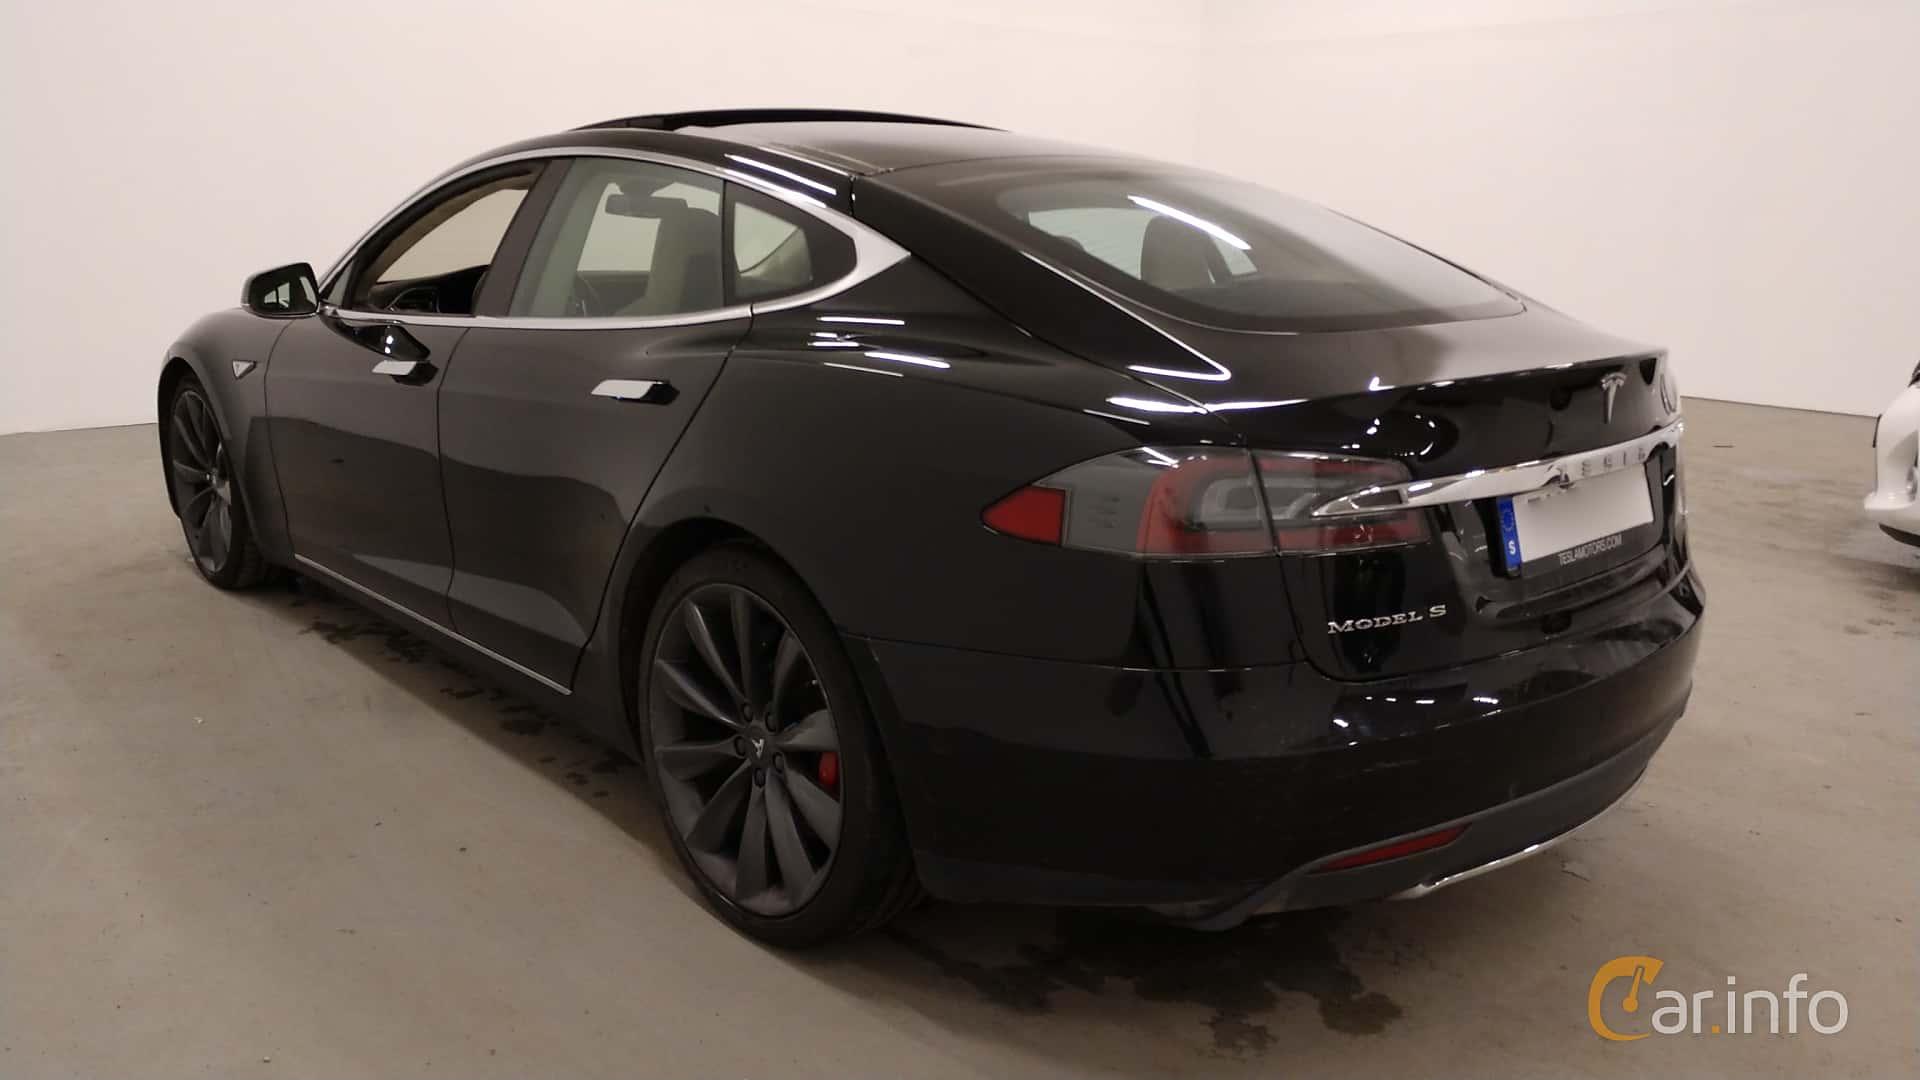 Tesla Model S P85D 85 kWh AWD Single Speed, 511hp, 2015